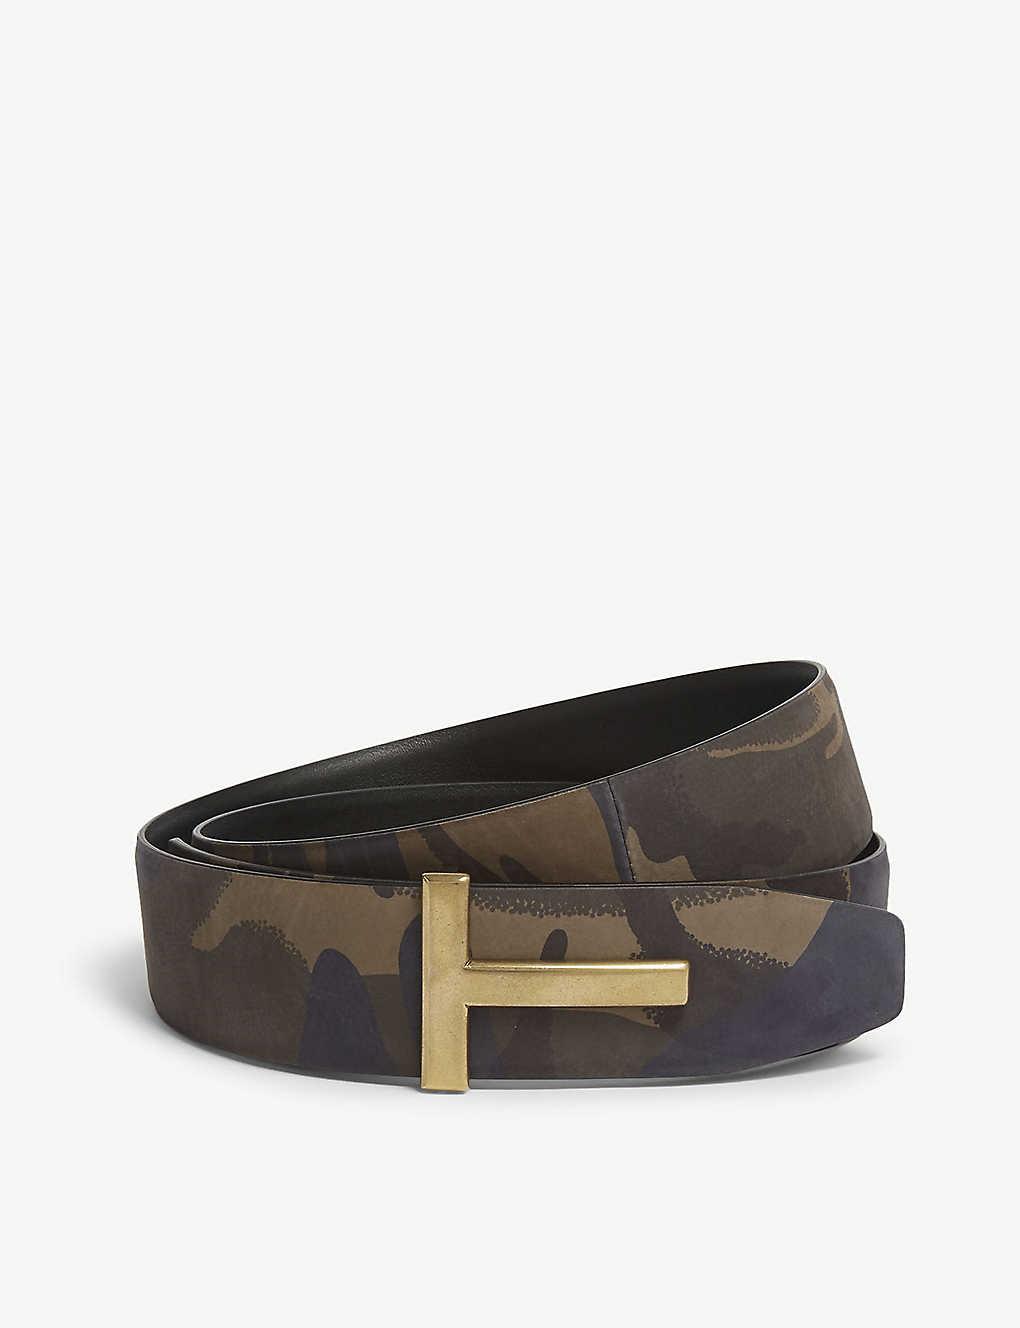 e3abf2539 TOM FORD - Camouflage leather 'T' belt | Selfridges.com